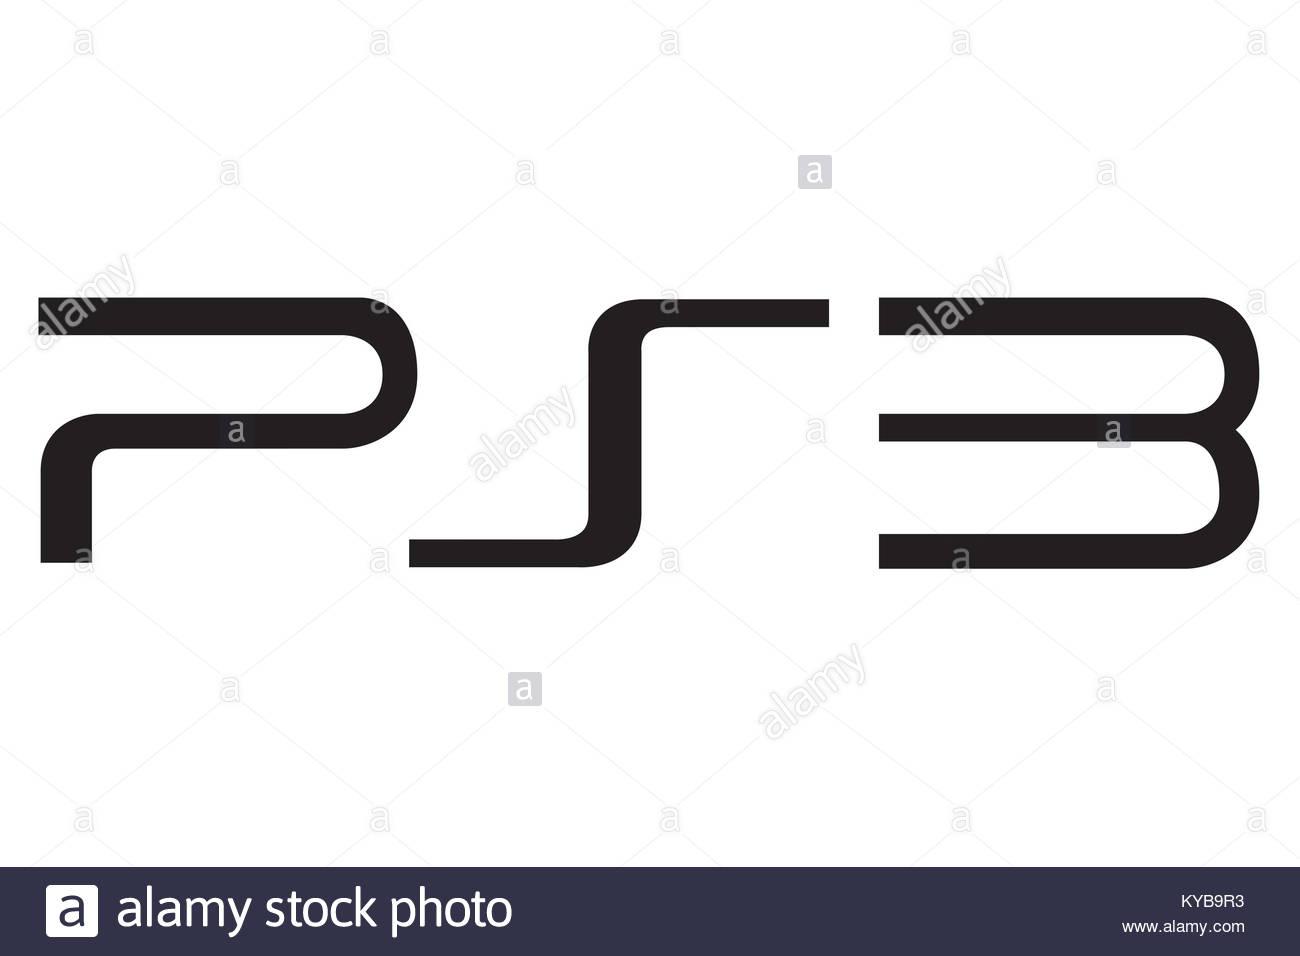 Playstation 3 stock photos playstation 3 stock images alamy playstation 3 logo stock image buycottarizona